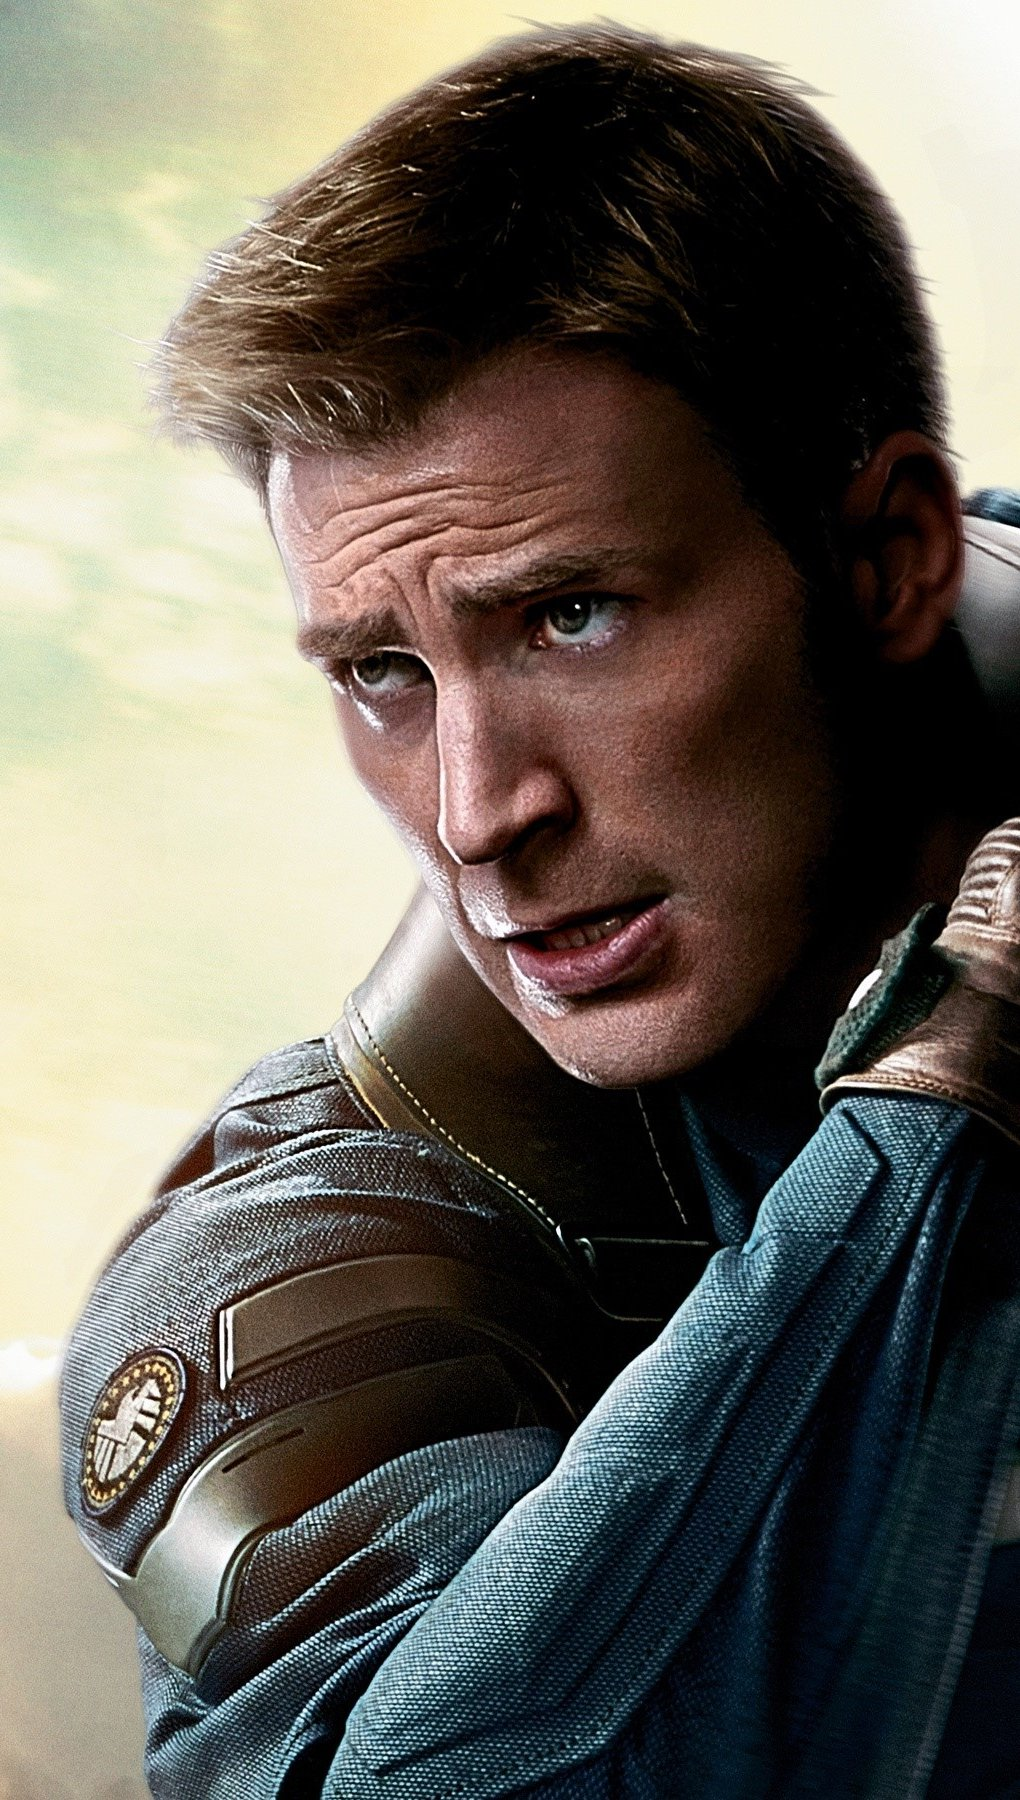 Wallpaper Chris Evans in Capitan America The Winter Soldier Vertical